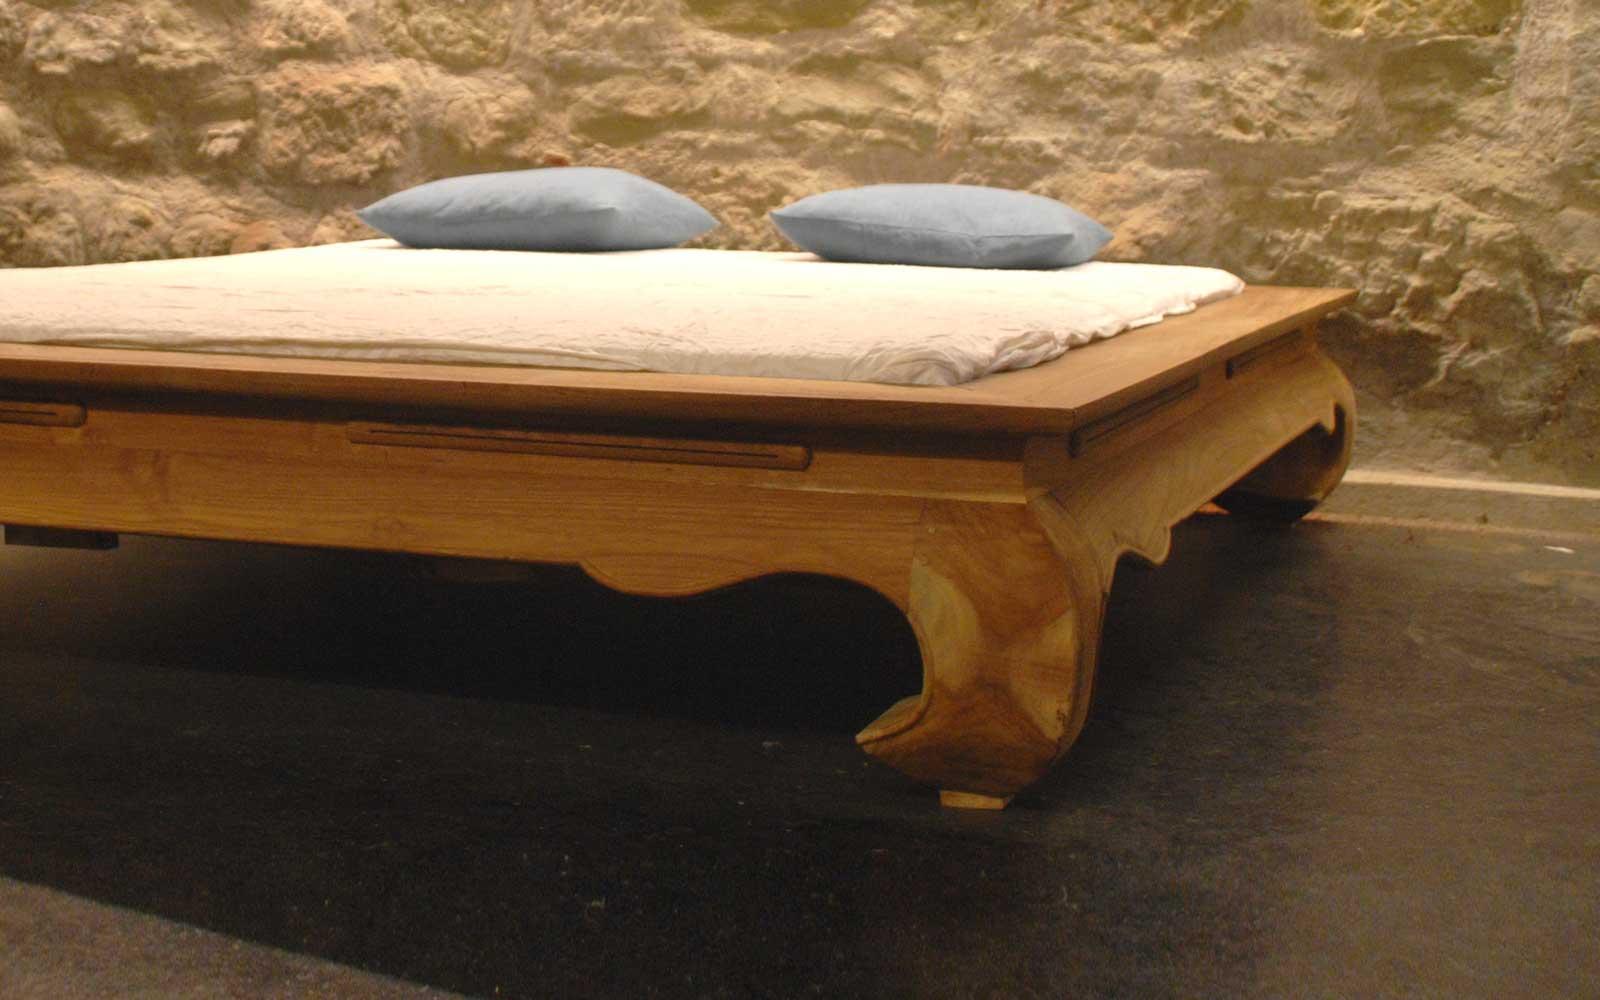 badezimmerm bel holz rattan neuesten. Black Bedroom Furniture Sets. Home Design Ideas